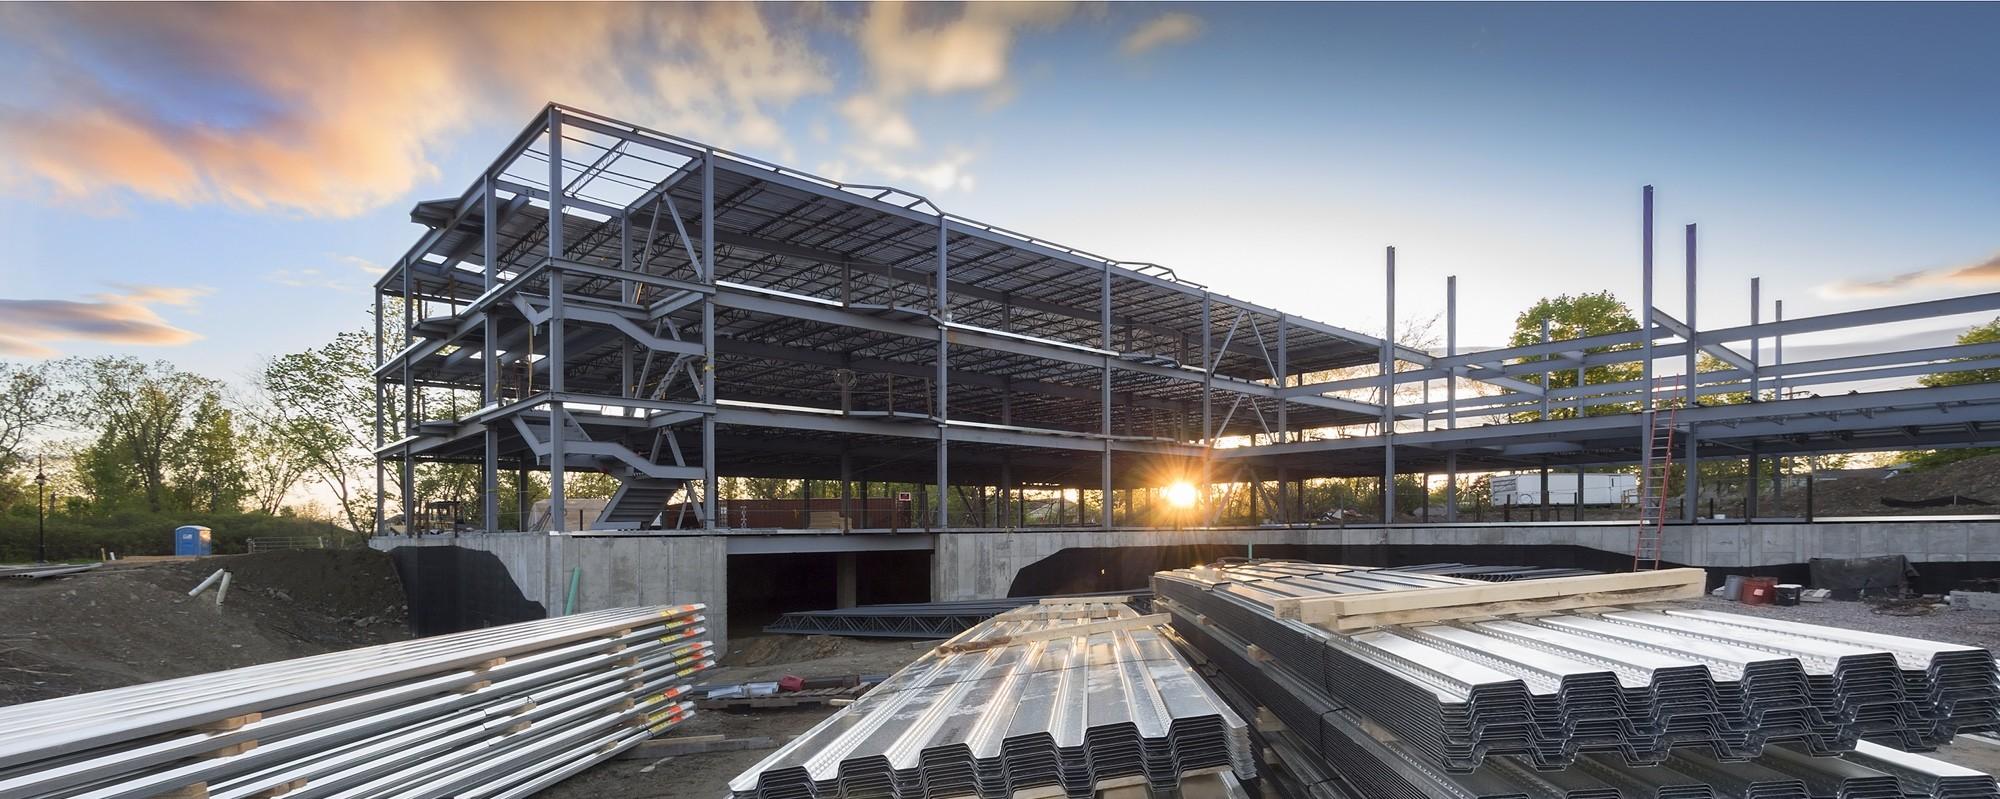 Commercial Building Construction Insurance